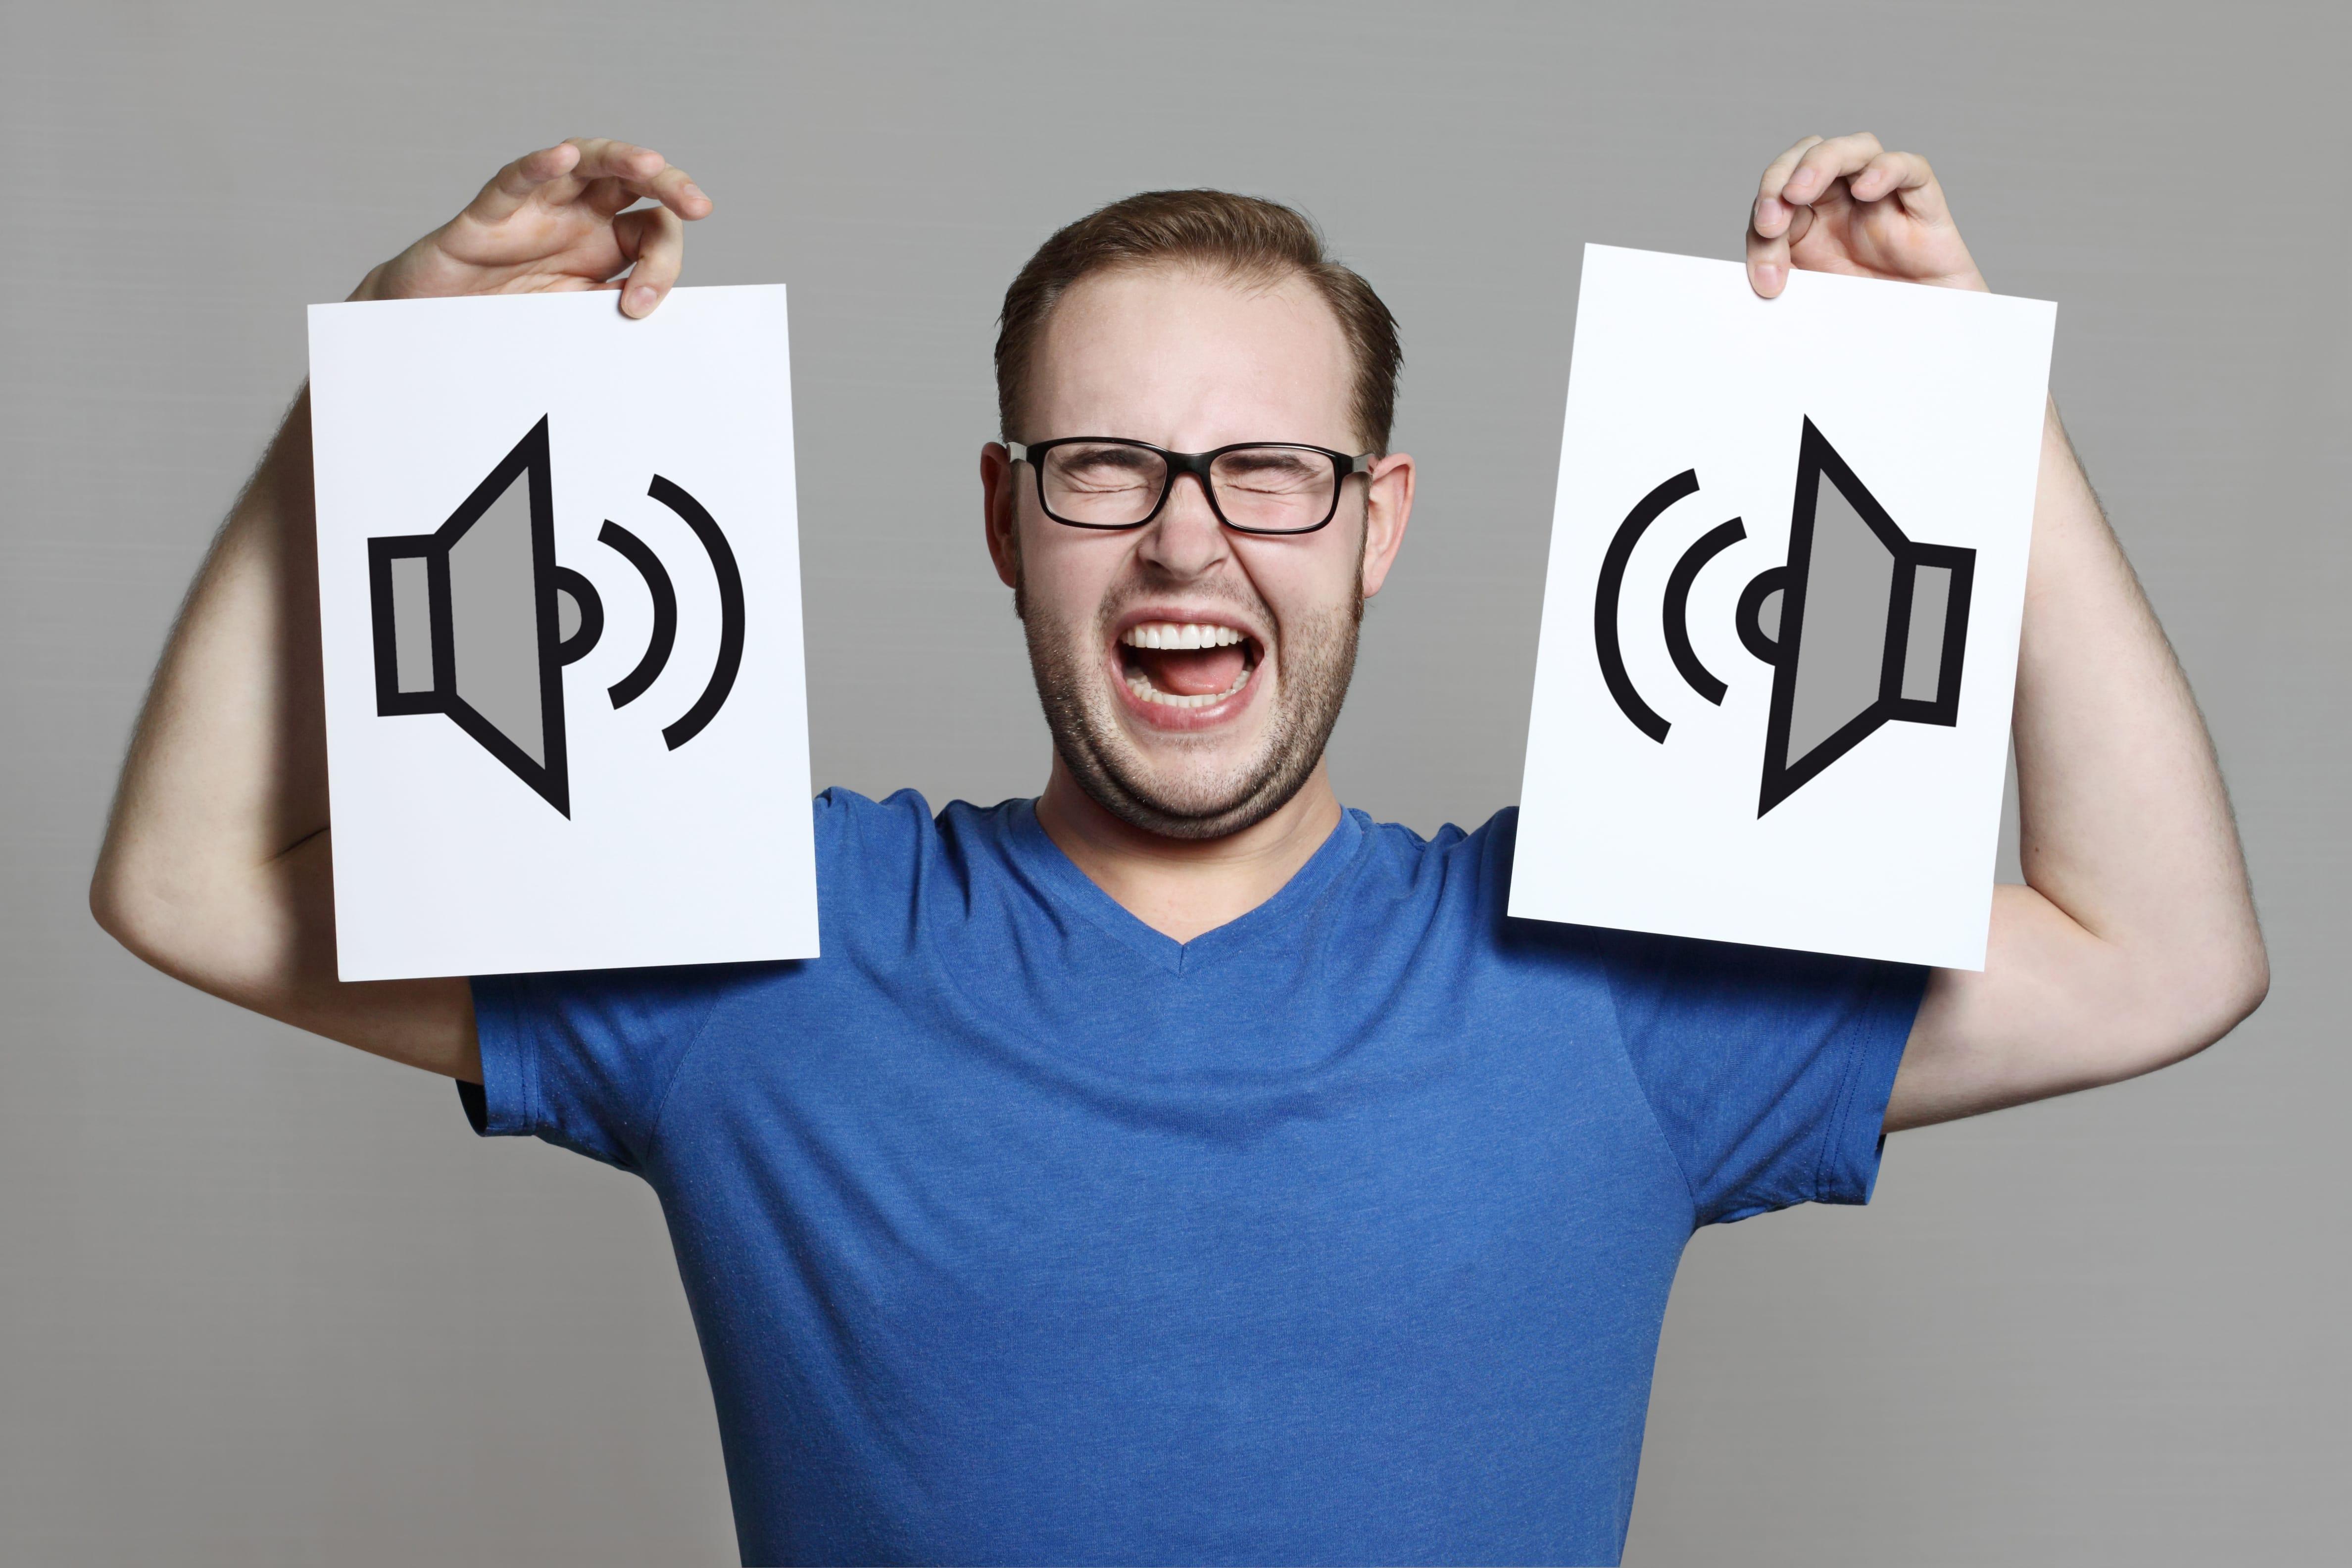 Картинка шум и человек